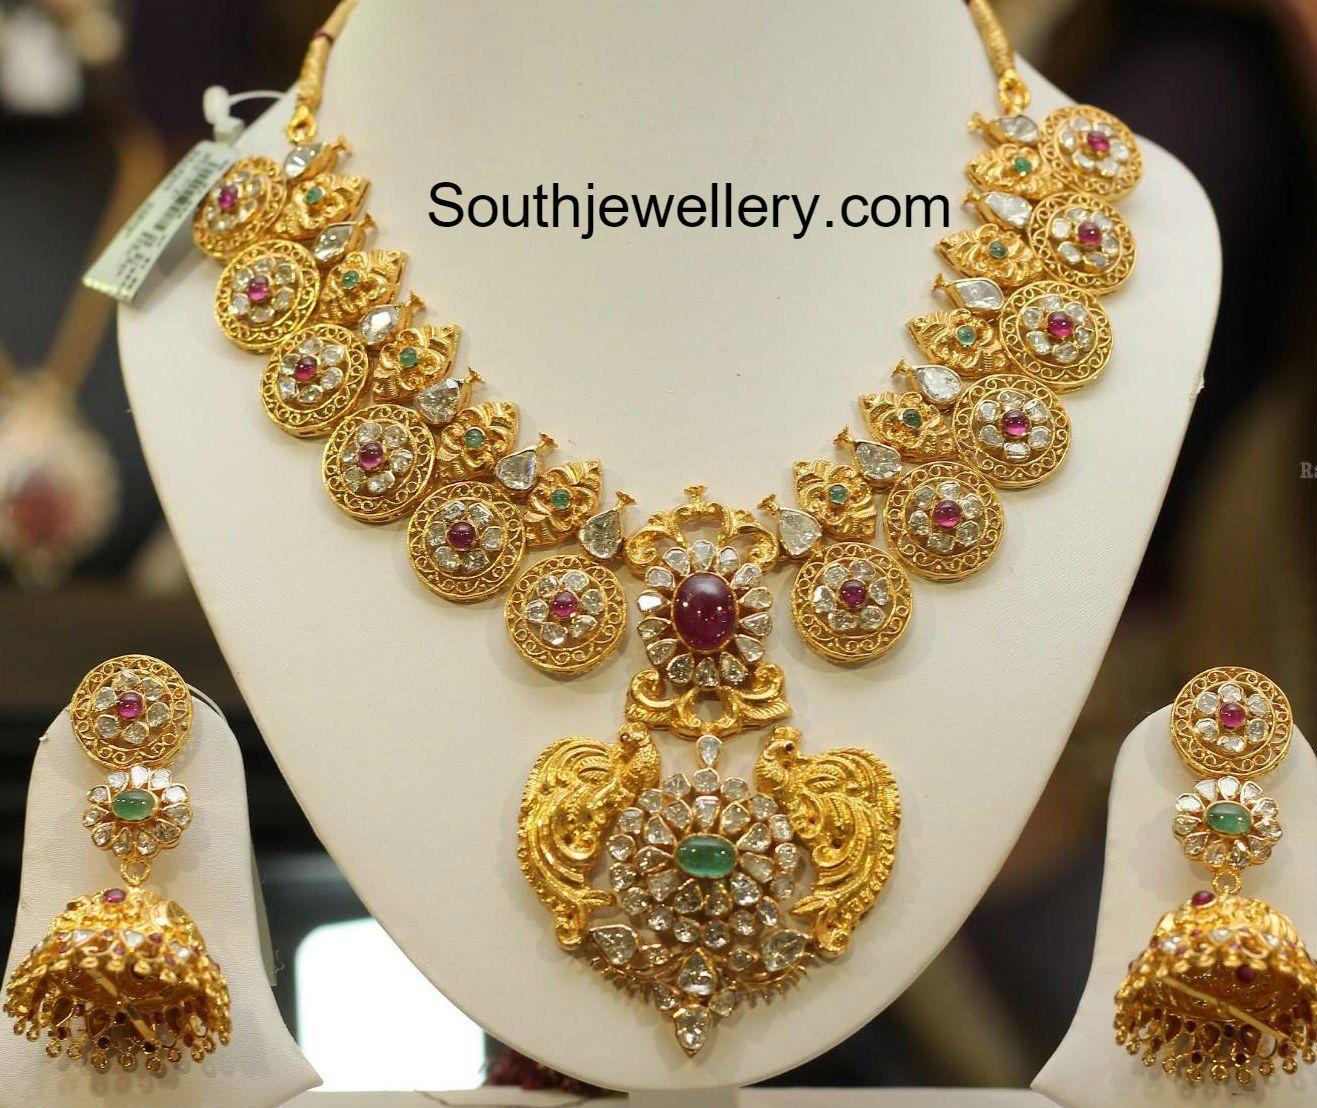 Pacchi Necklace and Jhumkas Set   Jewellery I like   Pinterest ...